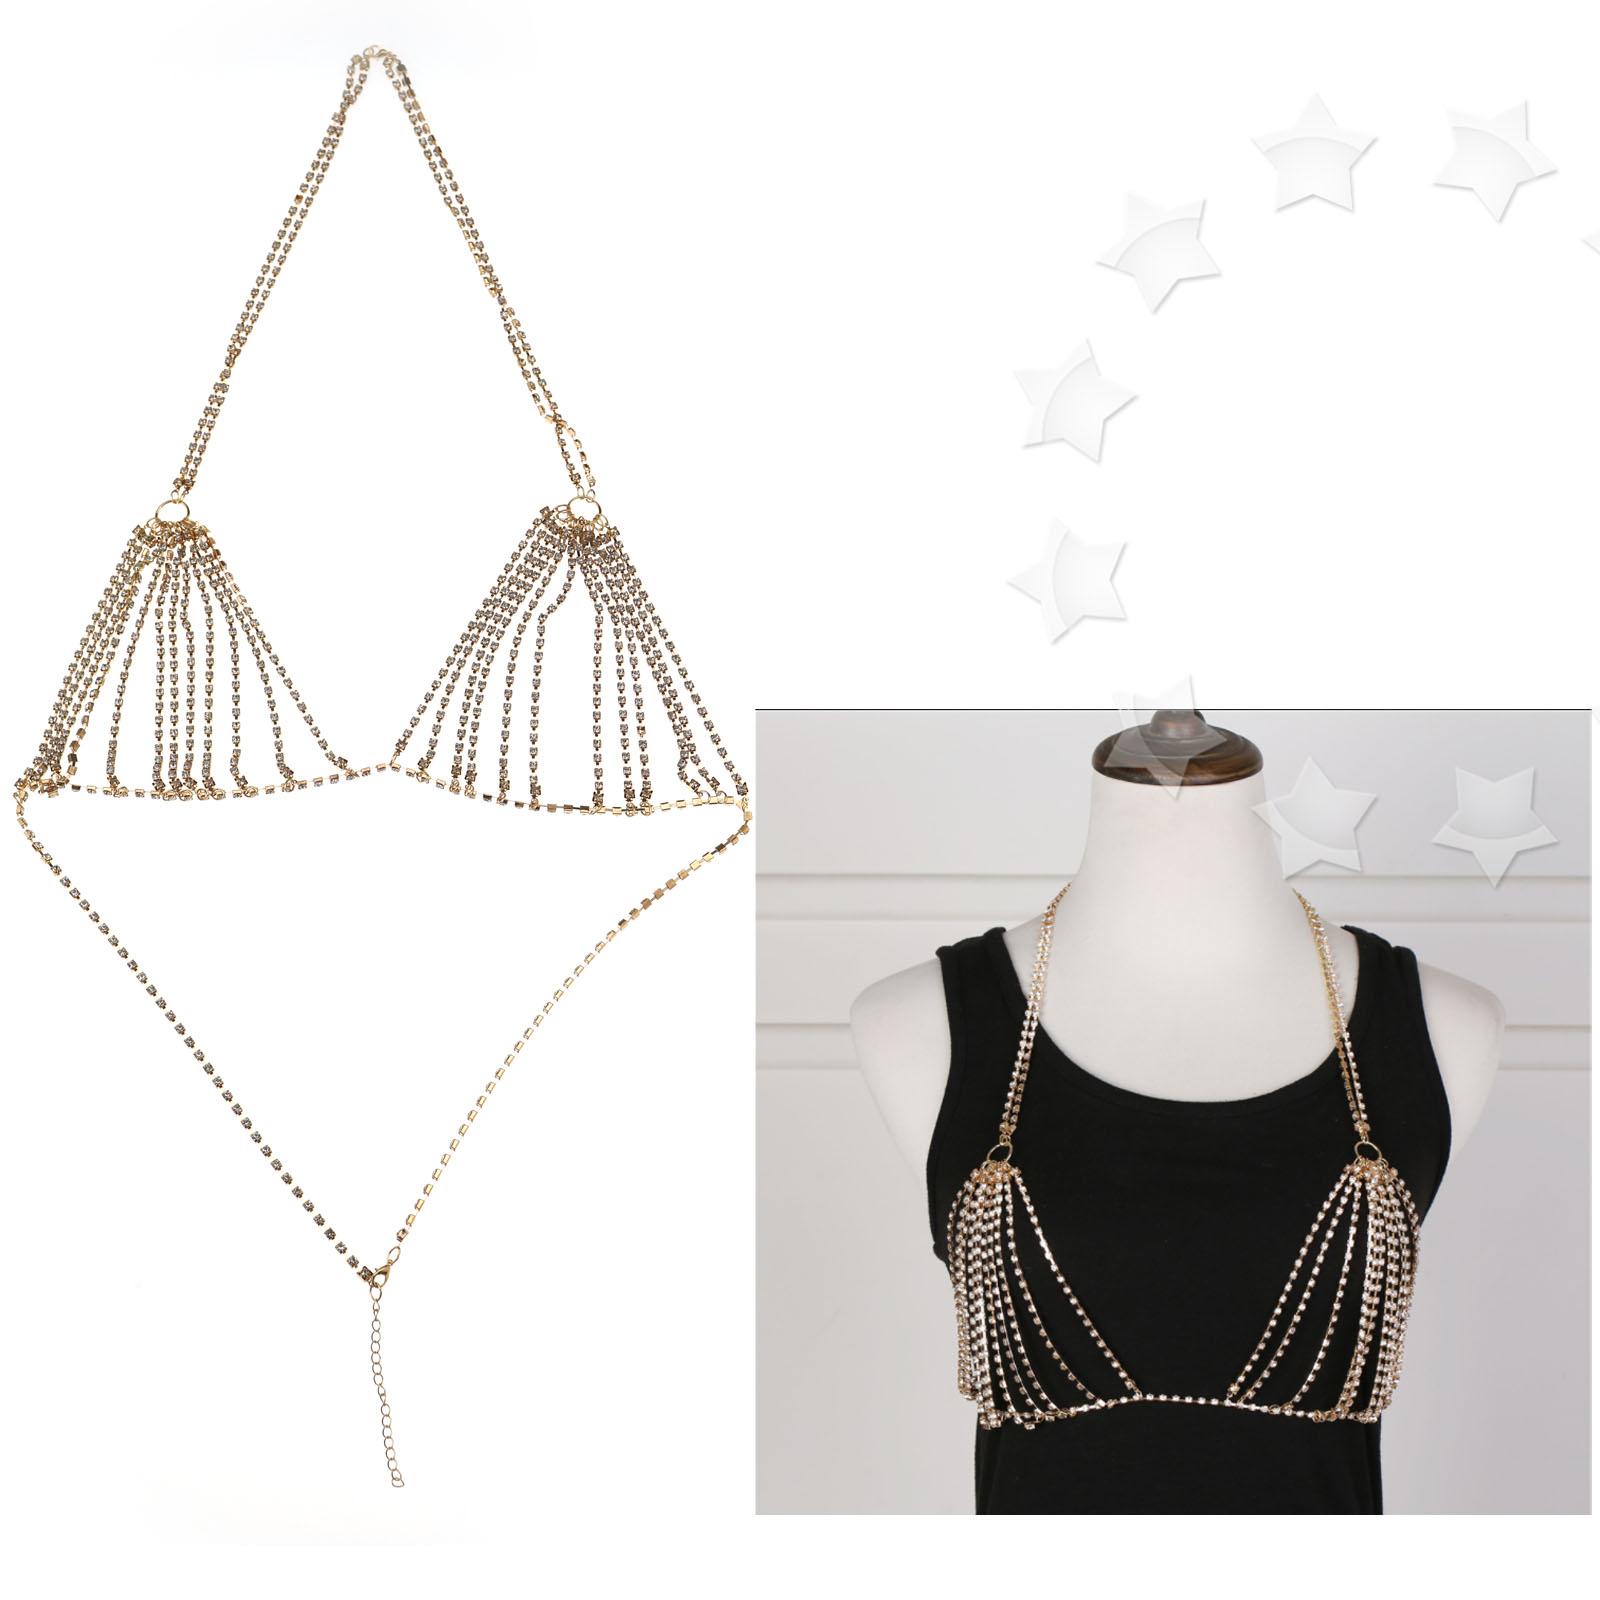 21523e4a320ed Details about Charm Shiny Crystal Rhinestone Bra Chest Harness Body Chain  Bikini Gold Silver